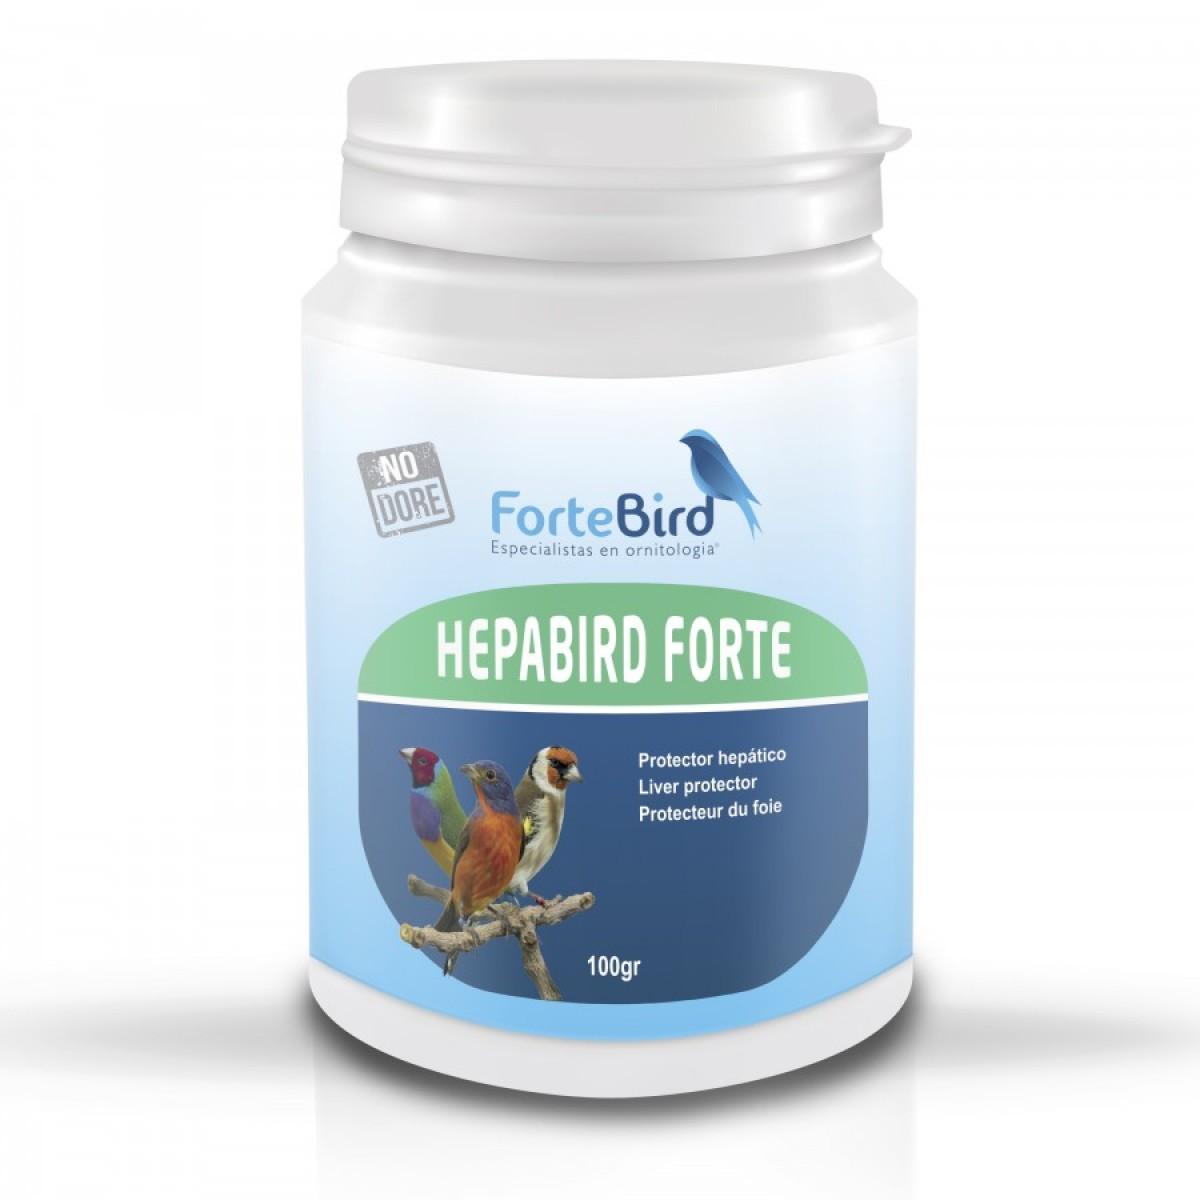 HepaBird Forte | Protector hepático 100gr